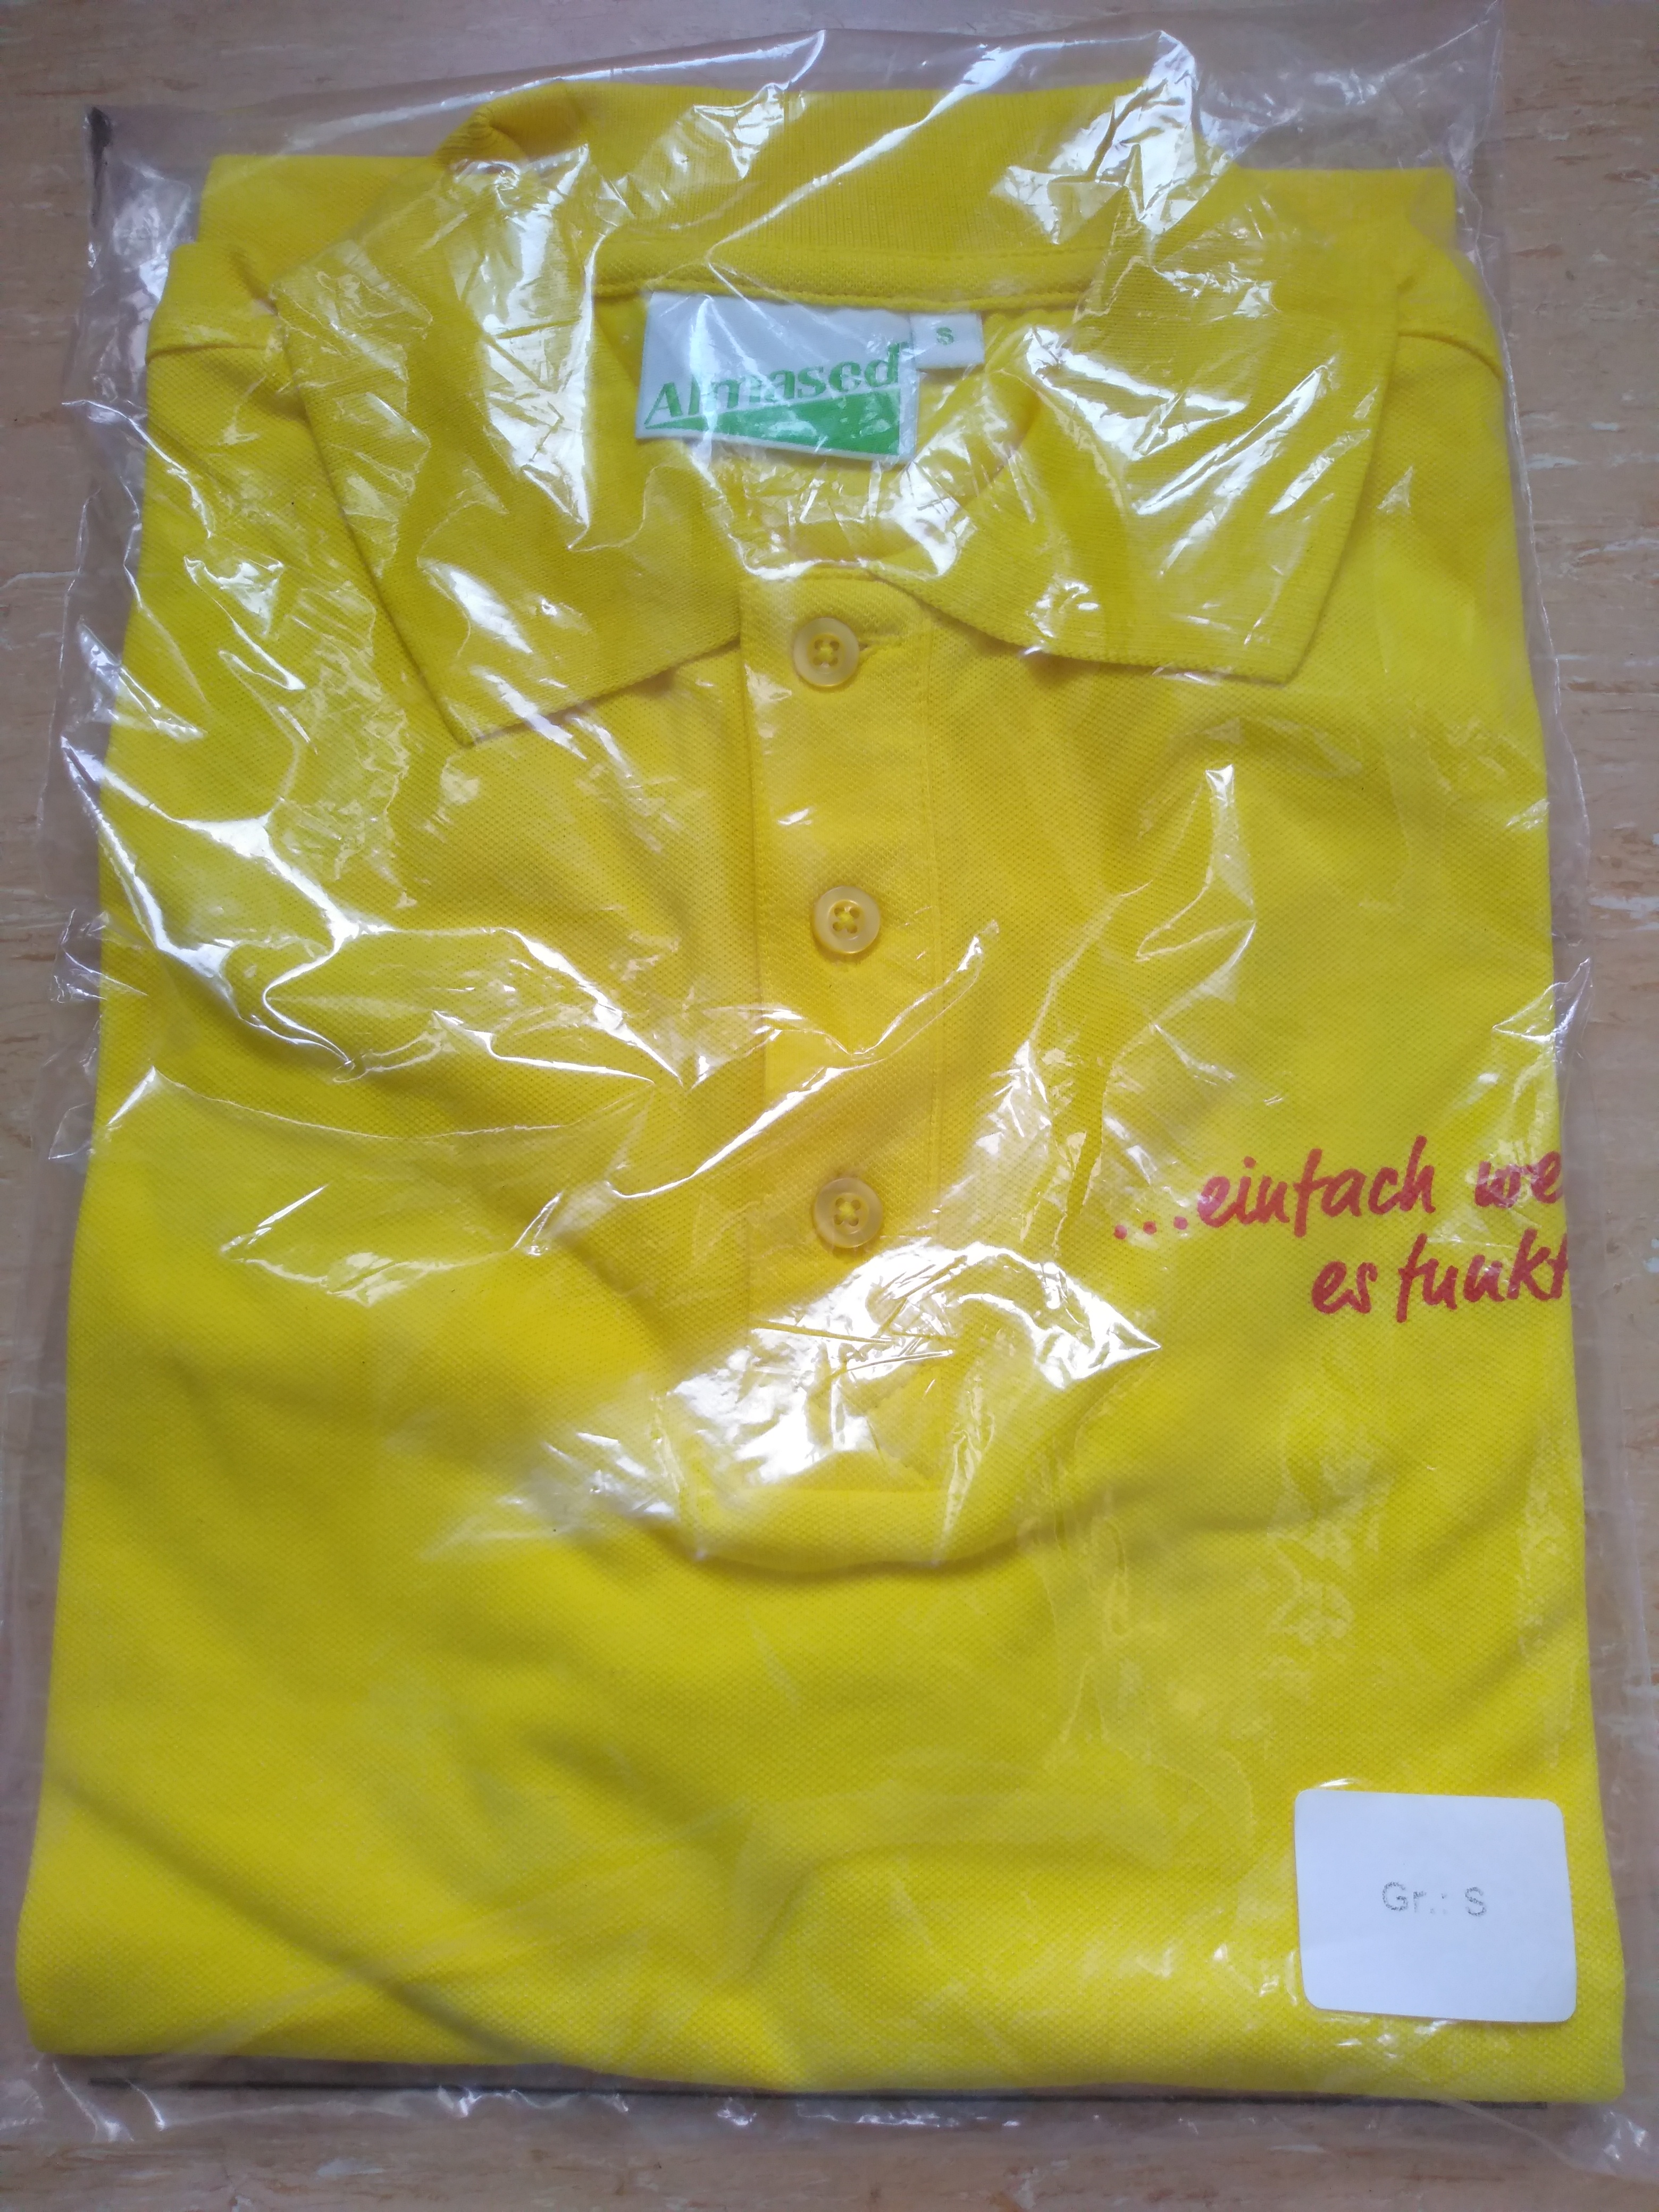 "Polo-Shirt ""Almased"" Gr.S tauschen"